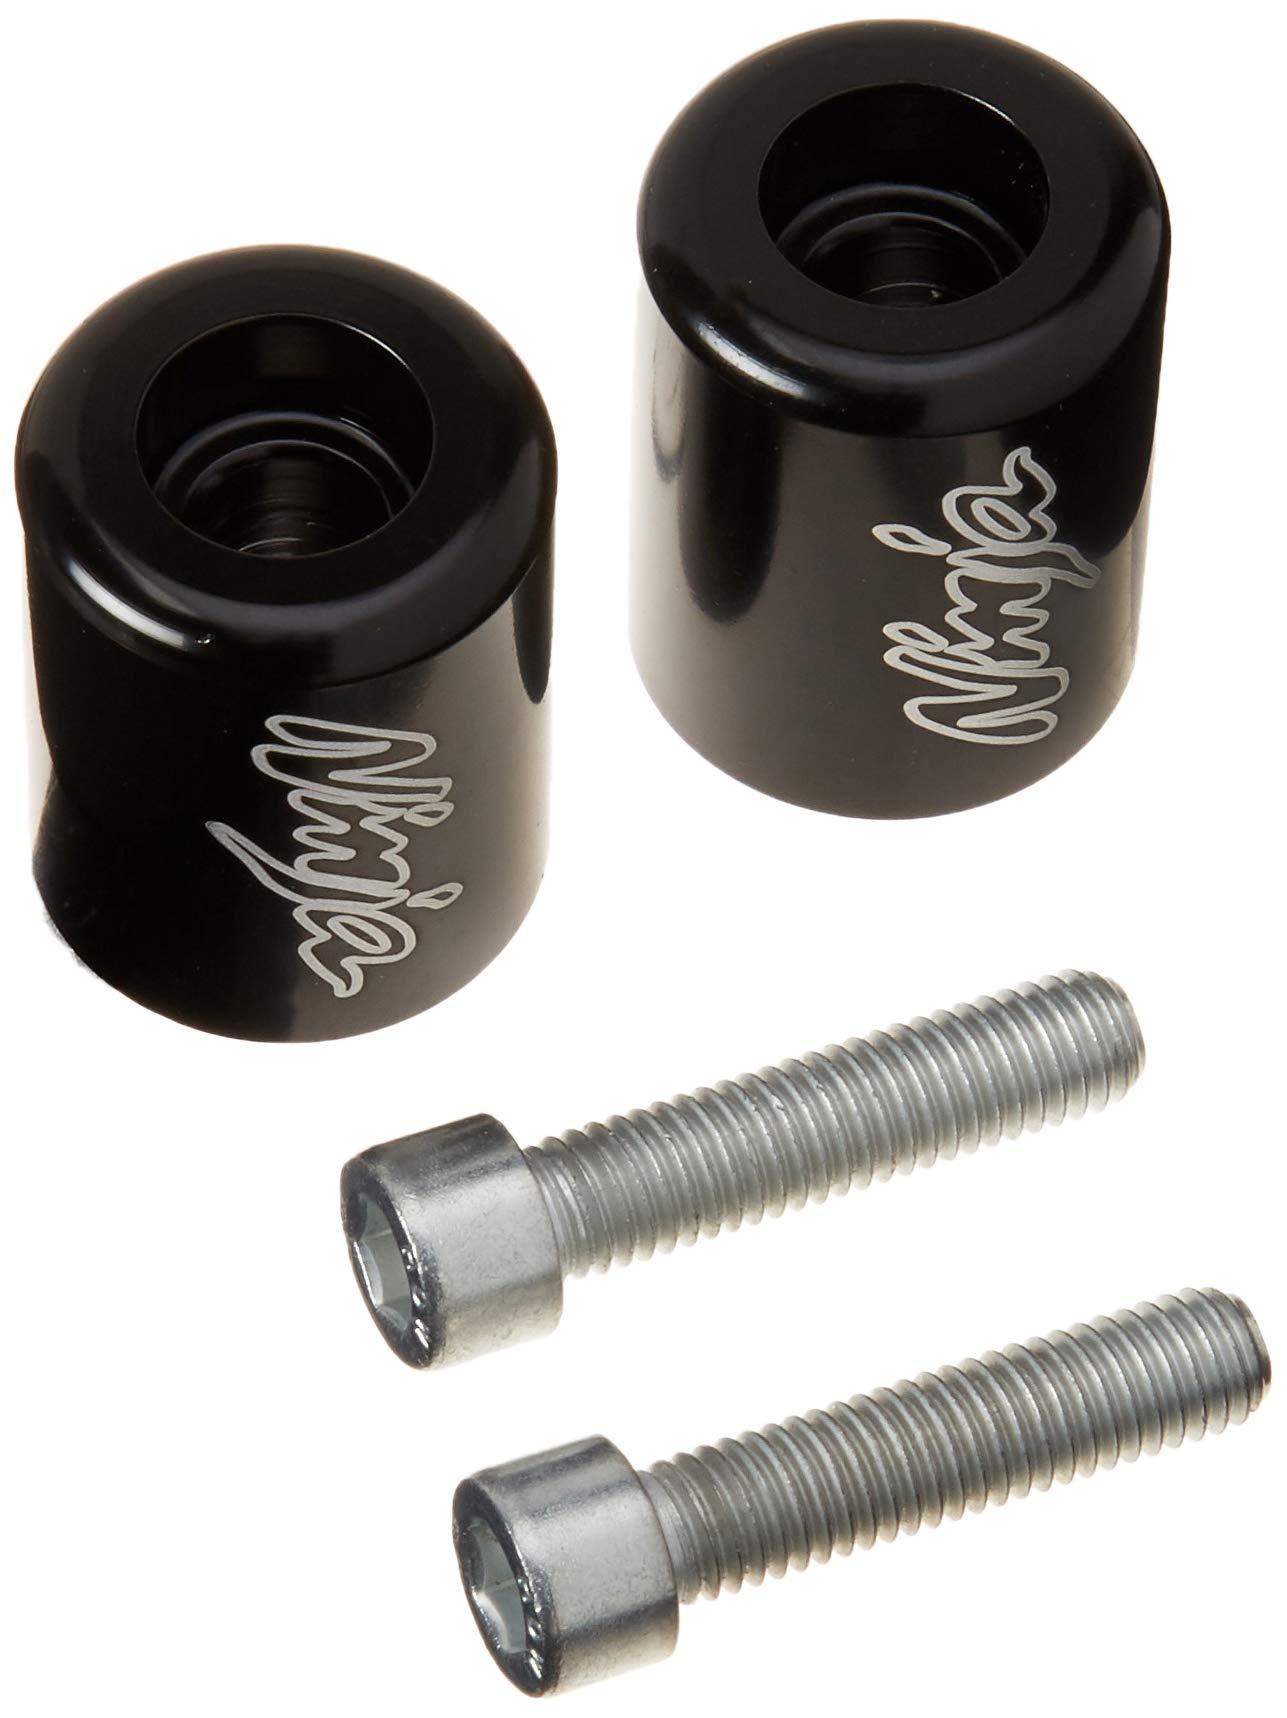 "Krator Black""Ninja"" Engraved Bar Ends Weights Sliders - for Kawasaki ZX6R, ZX7R, ZX9R, ZX10R, ZX12R and More! (1987-2012)"